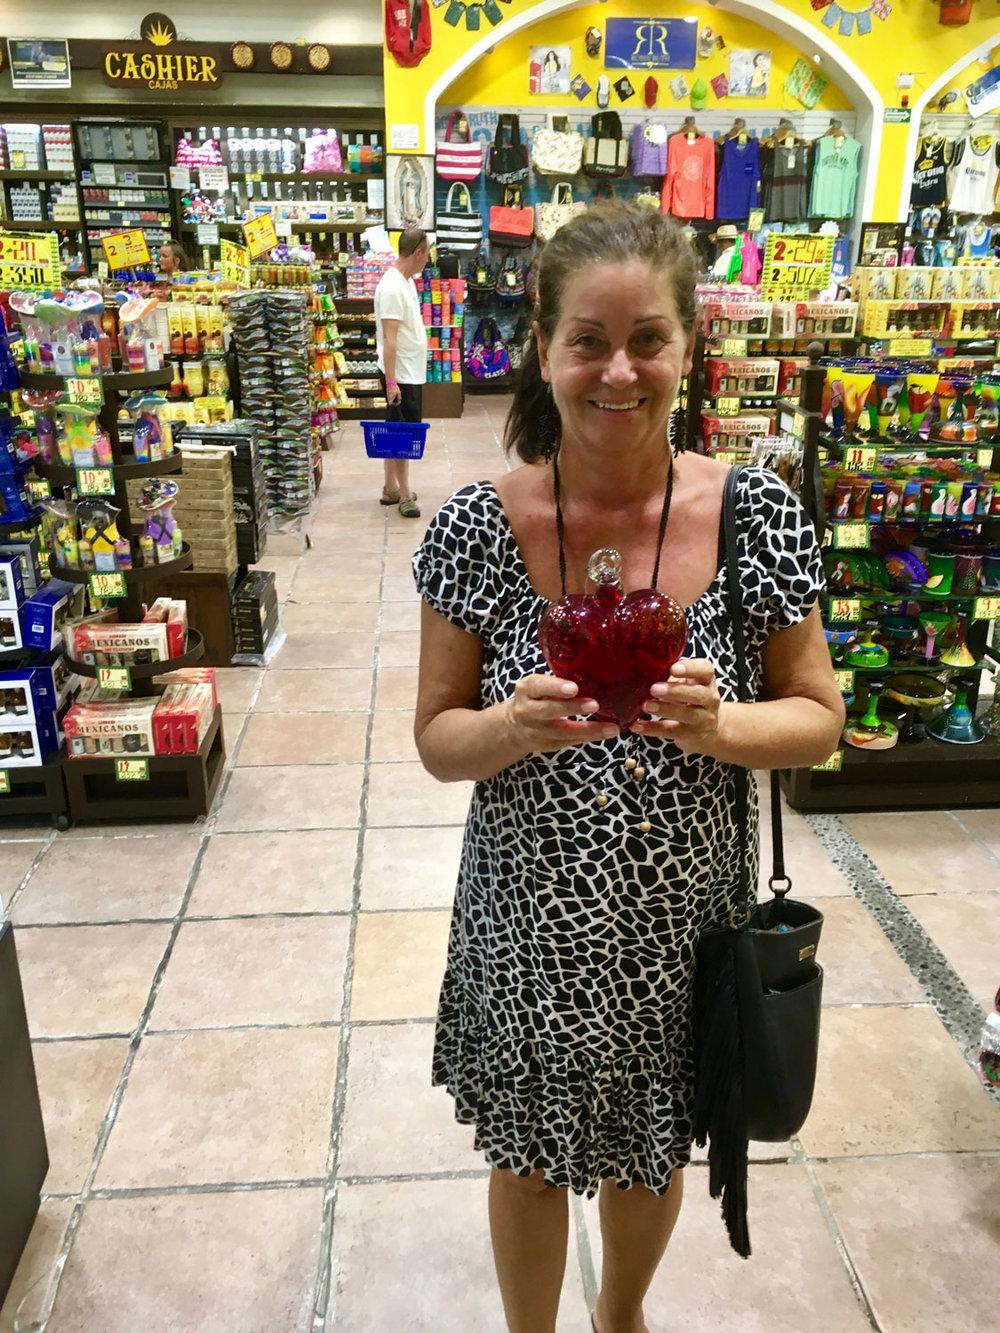 Hammocks_and_Ruins_Blog_Riviera_Maya_Mexico_Travel_Discover_Explore_What_to_do_Playa_del_Carmen_28.jpg